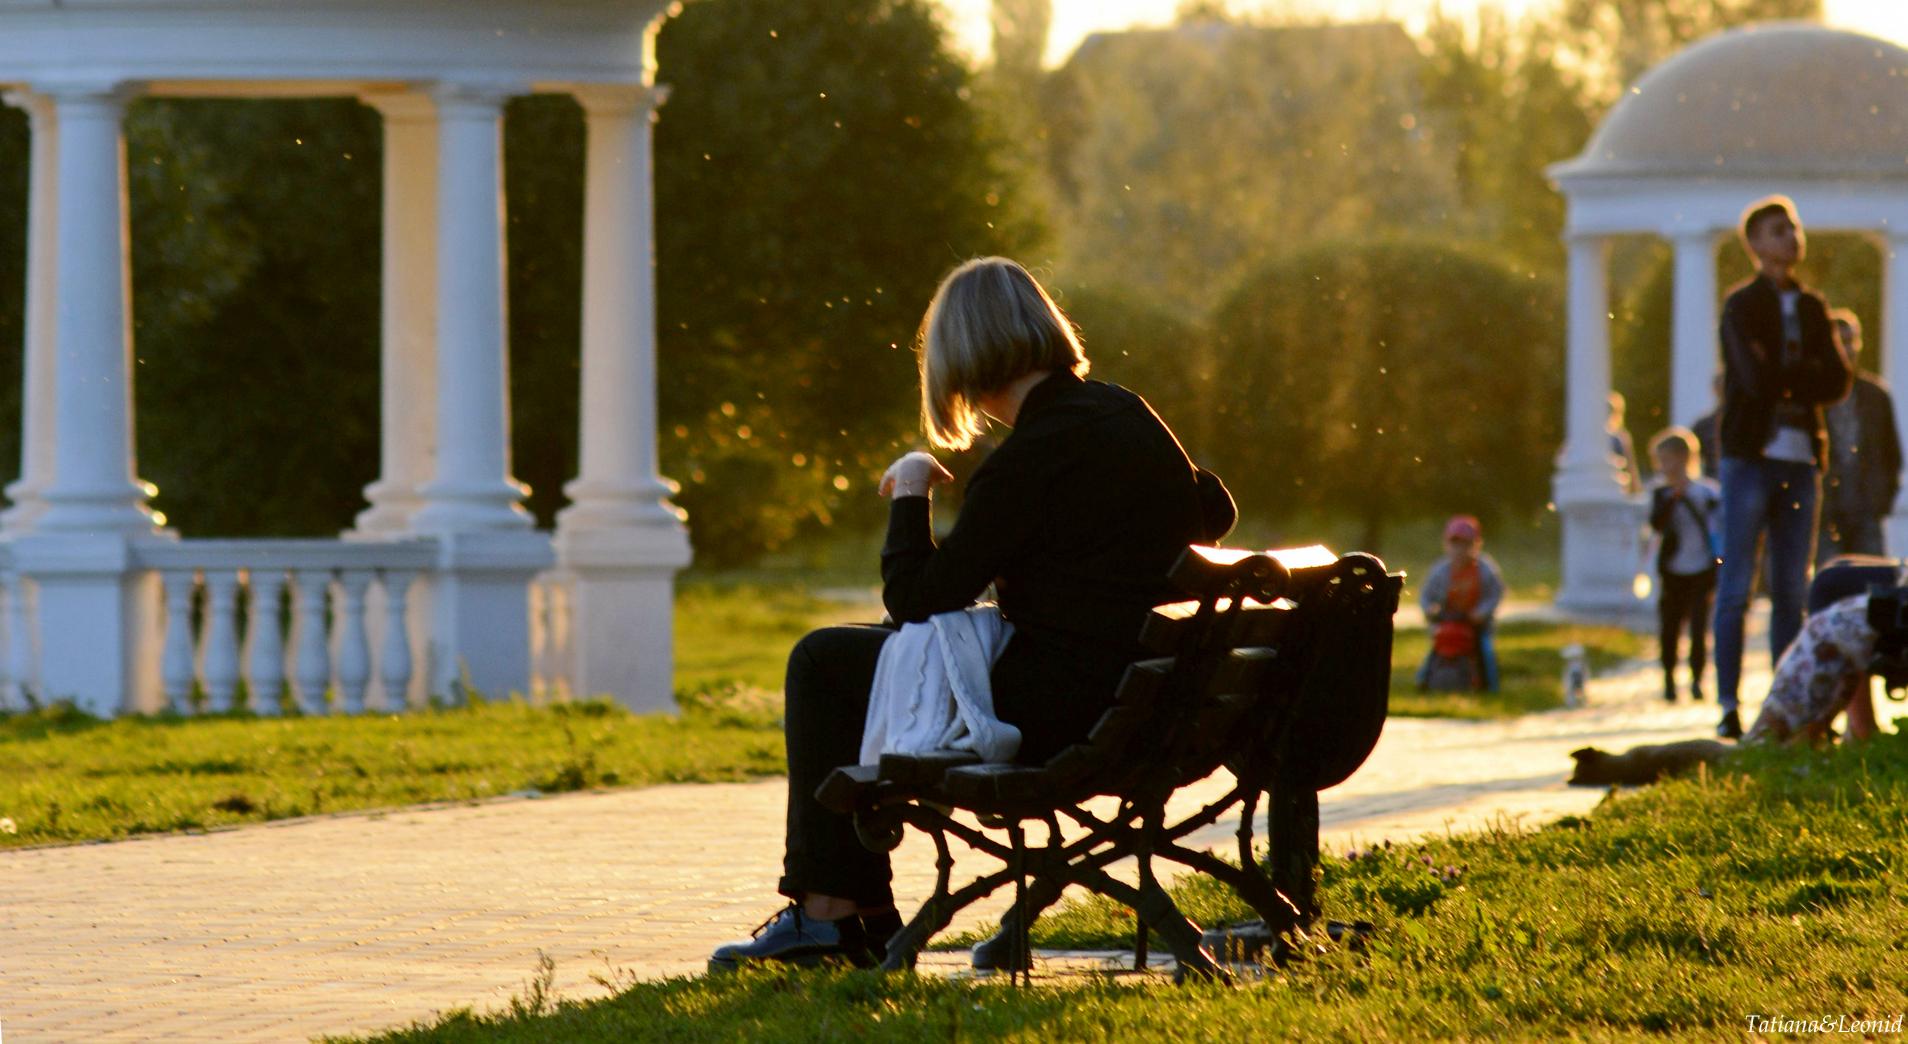 Ребенок от первого брака - не проблема нового мужа